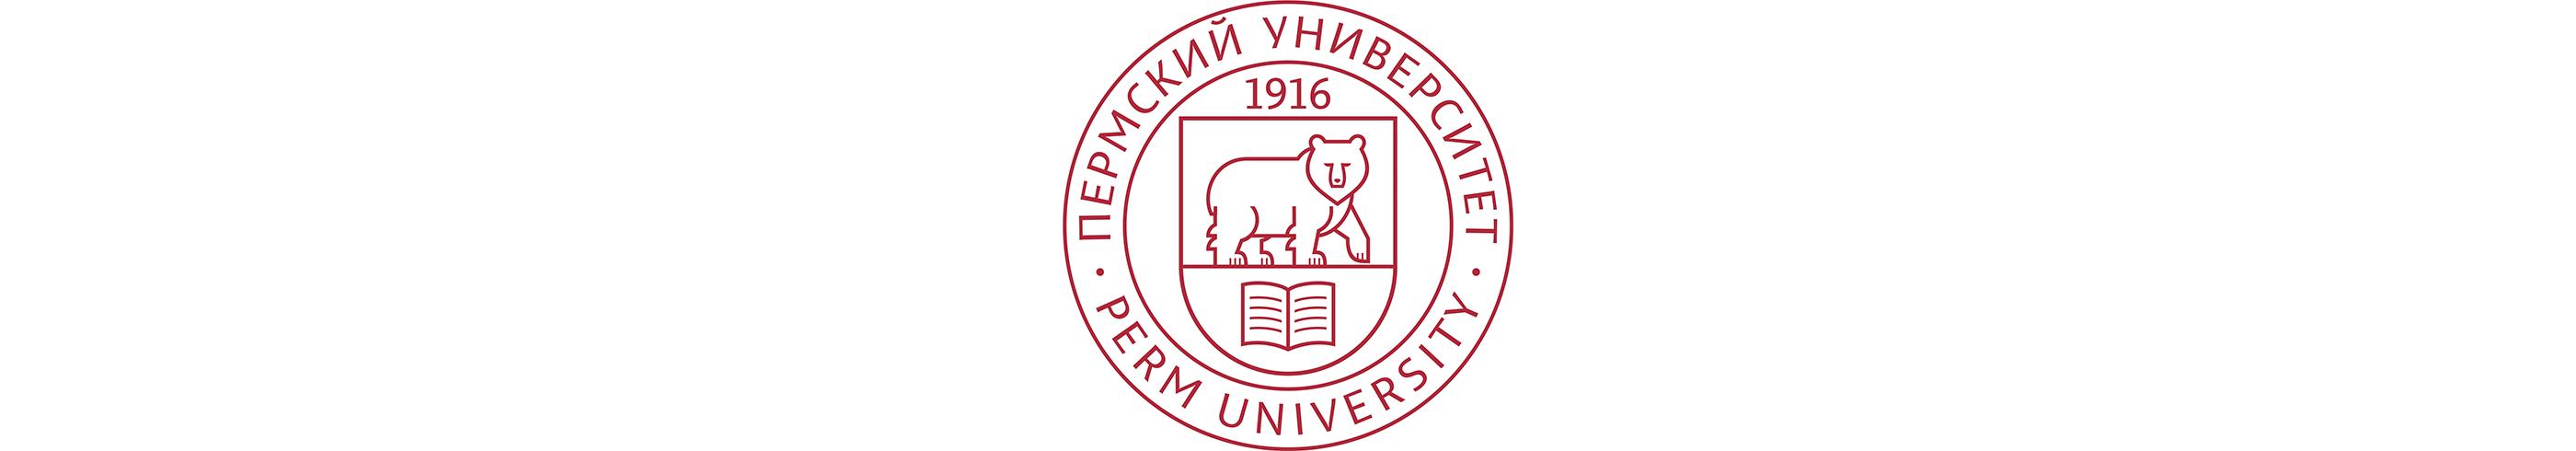 logo_psu знак